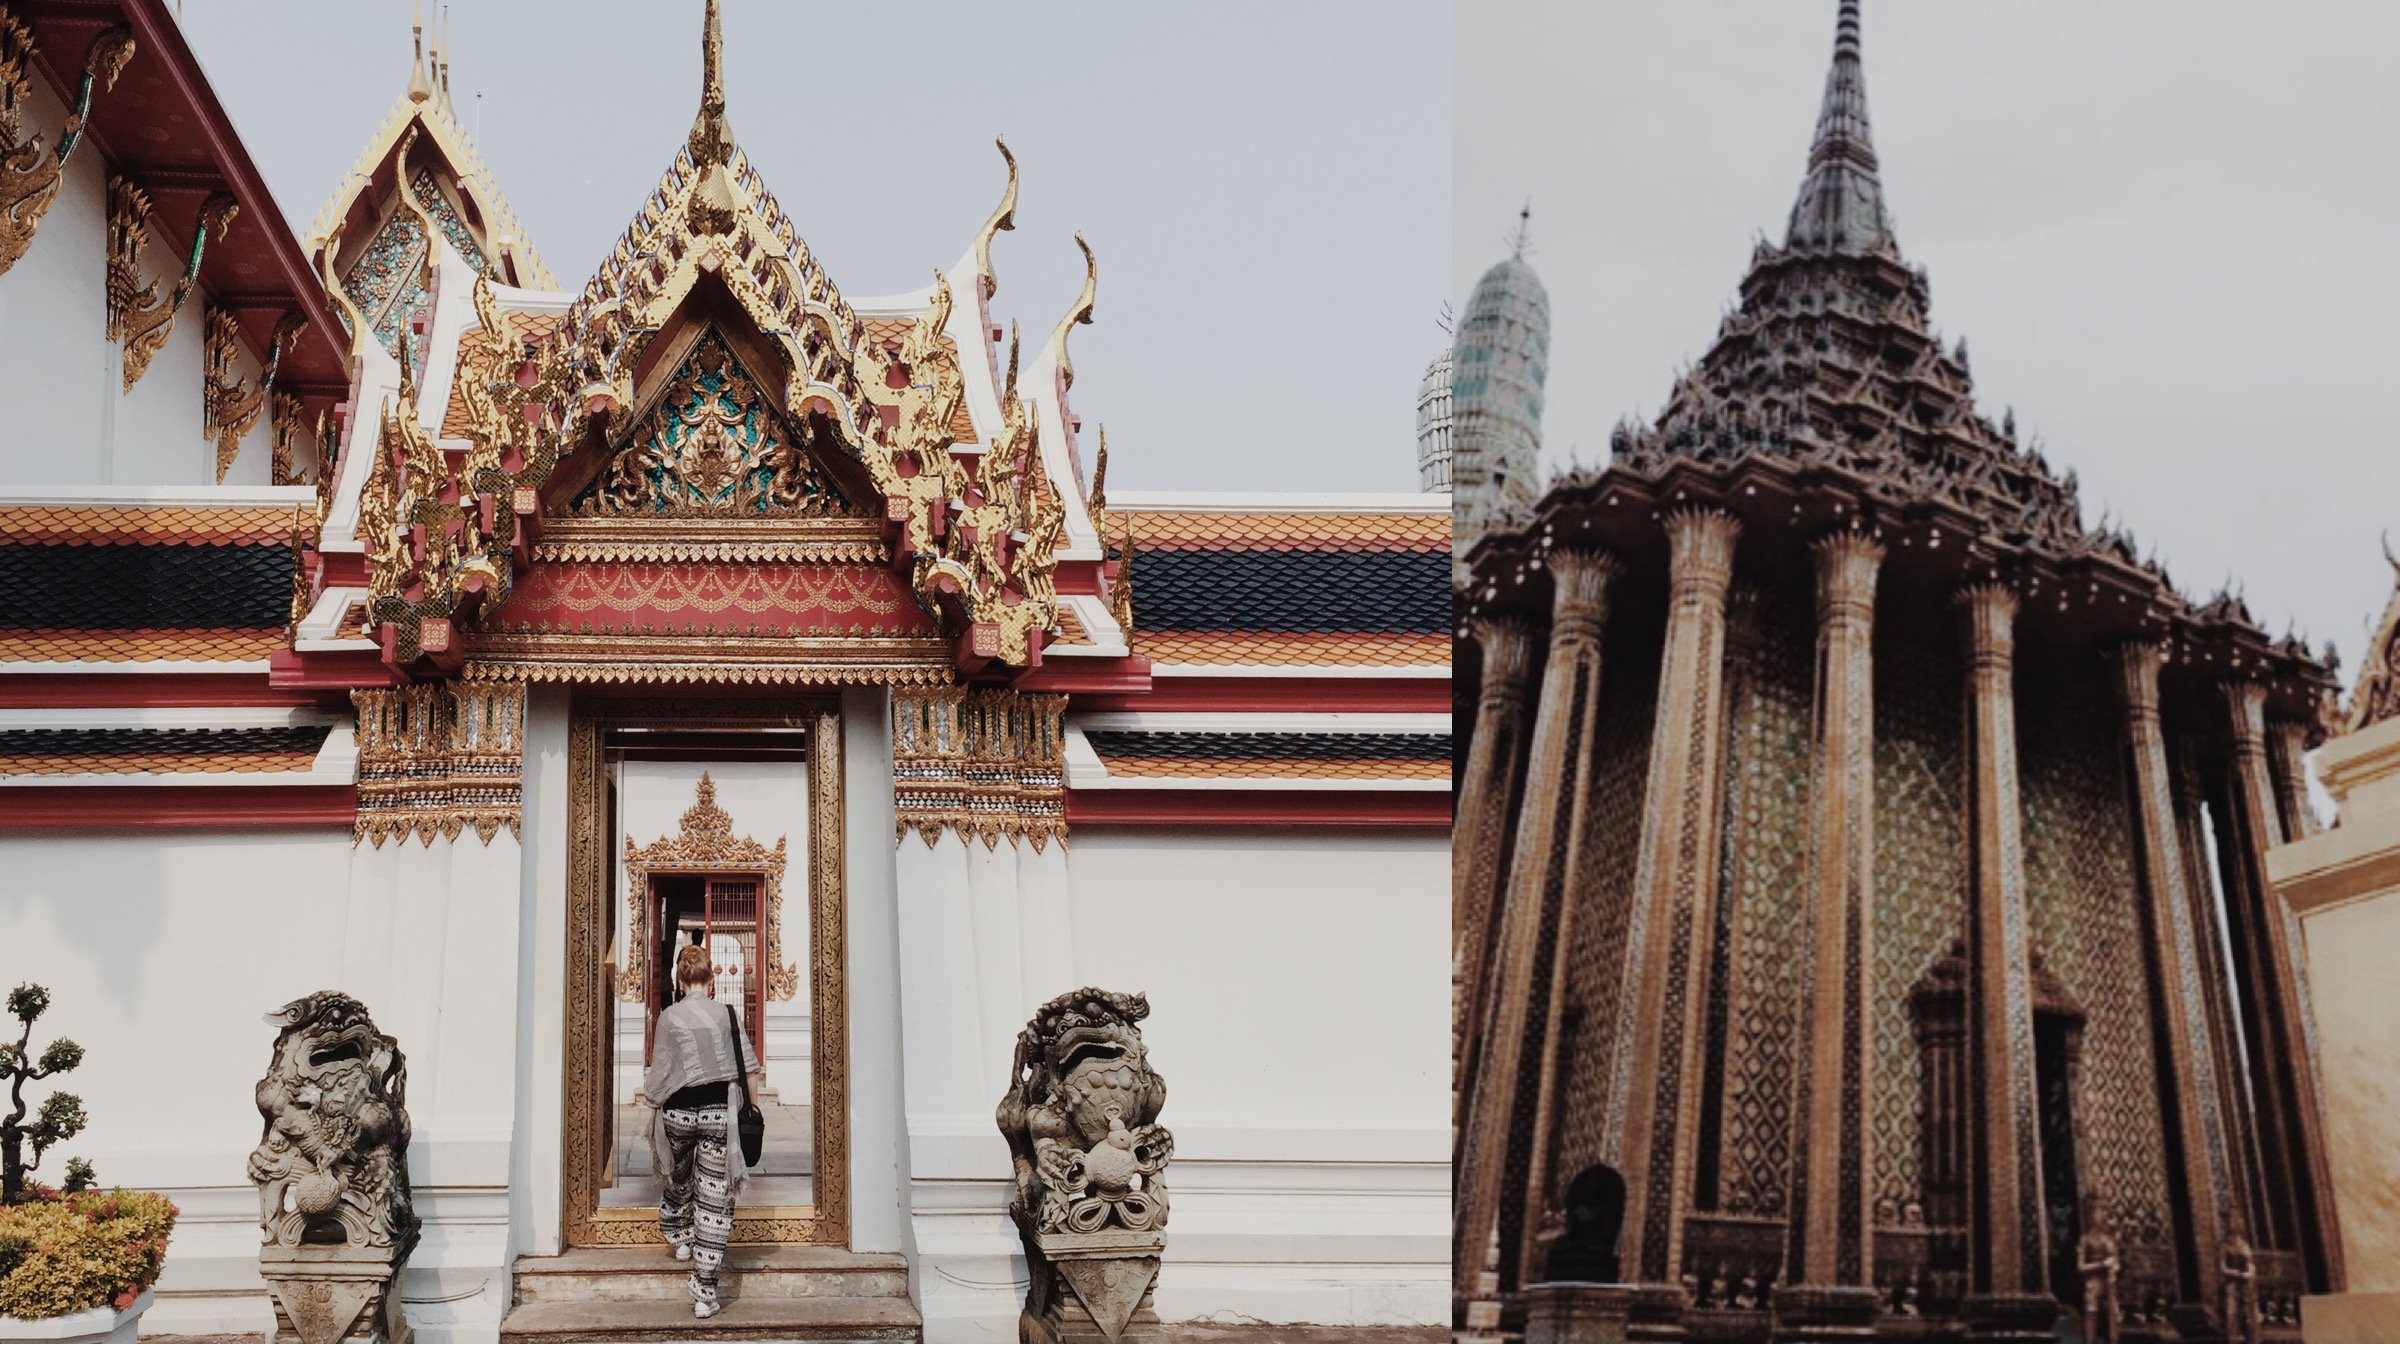 sta templeday 007.JPG